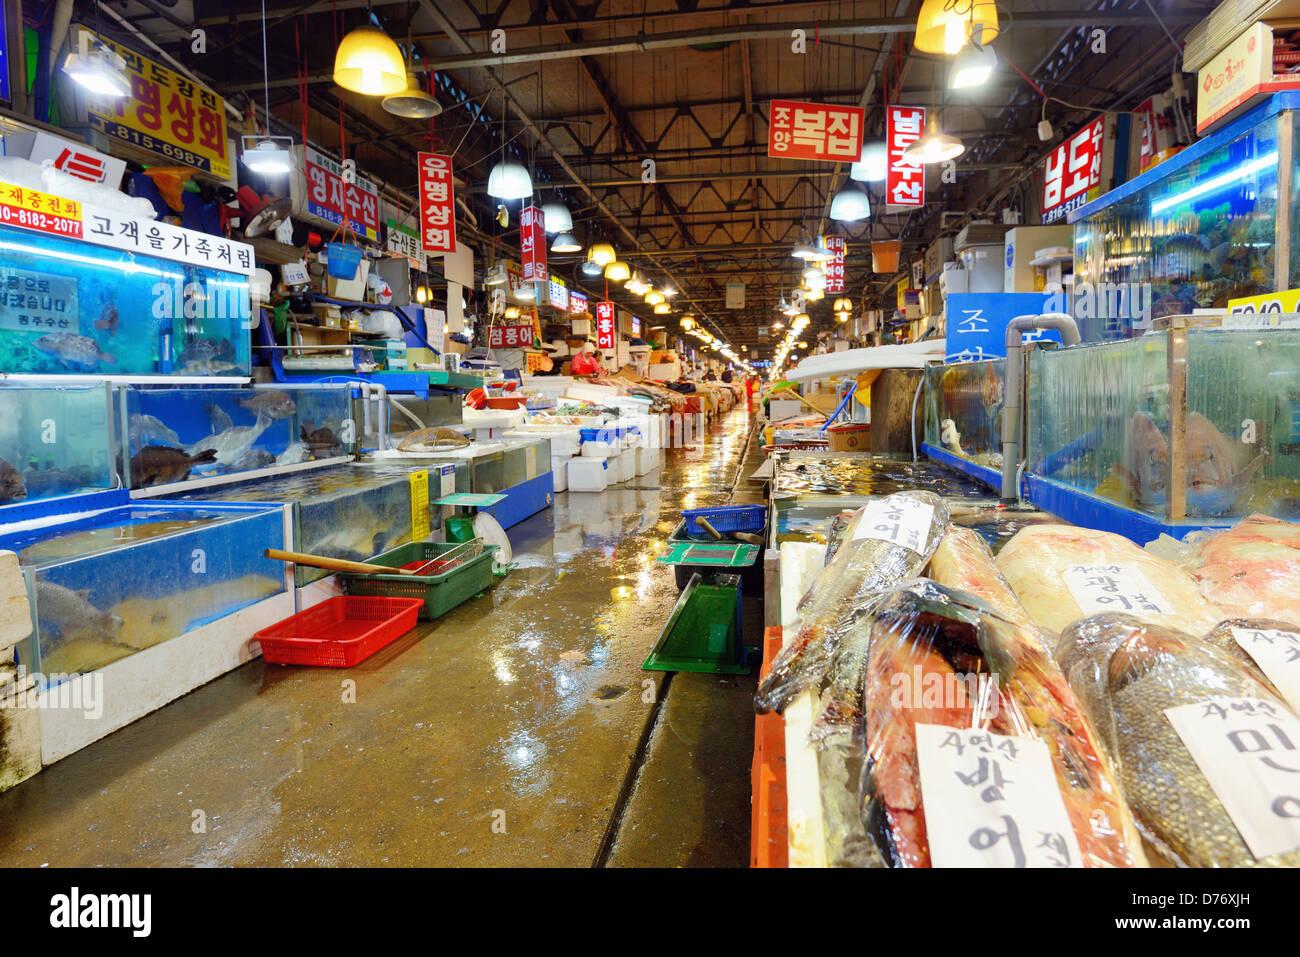 Noryangjin Mercado Mayorista Pesquero en Seúl, Corea del Sur Foto de stock